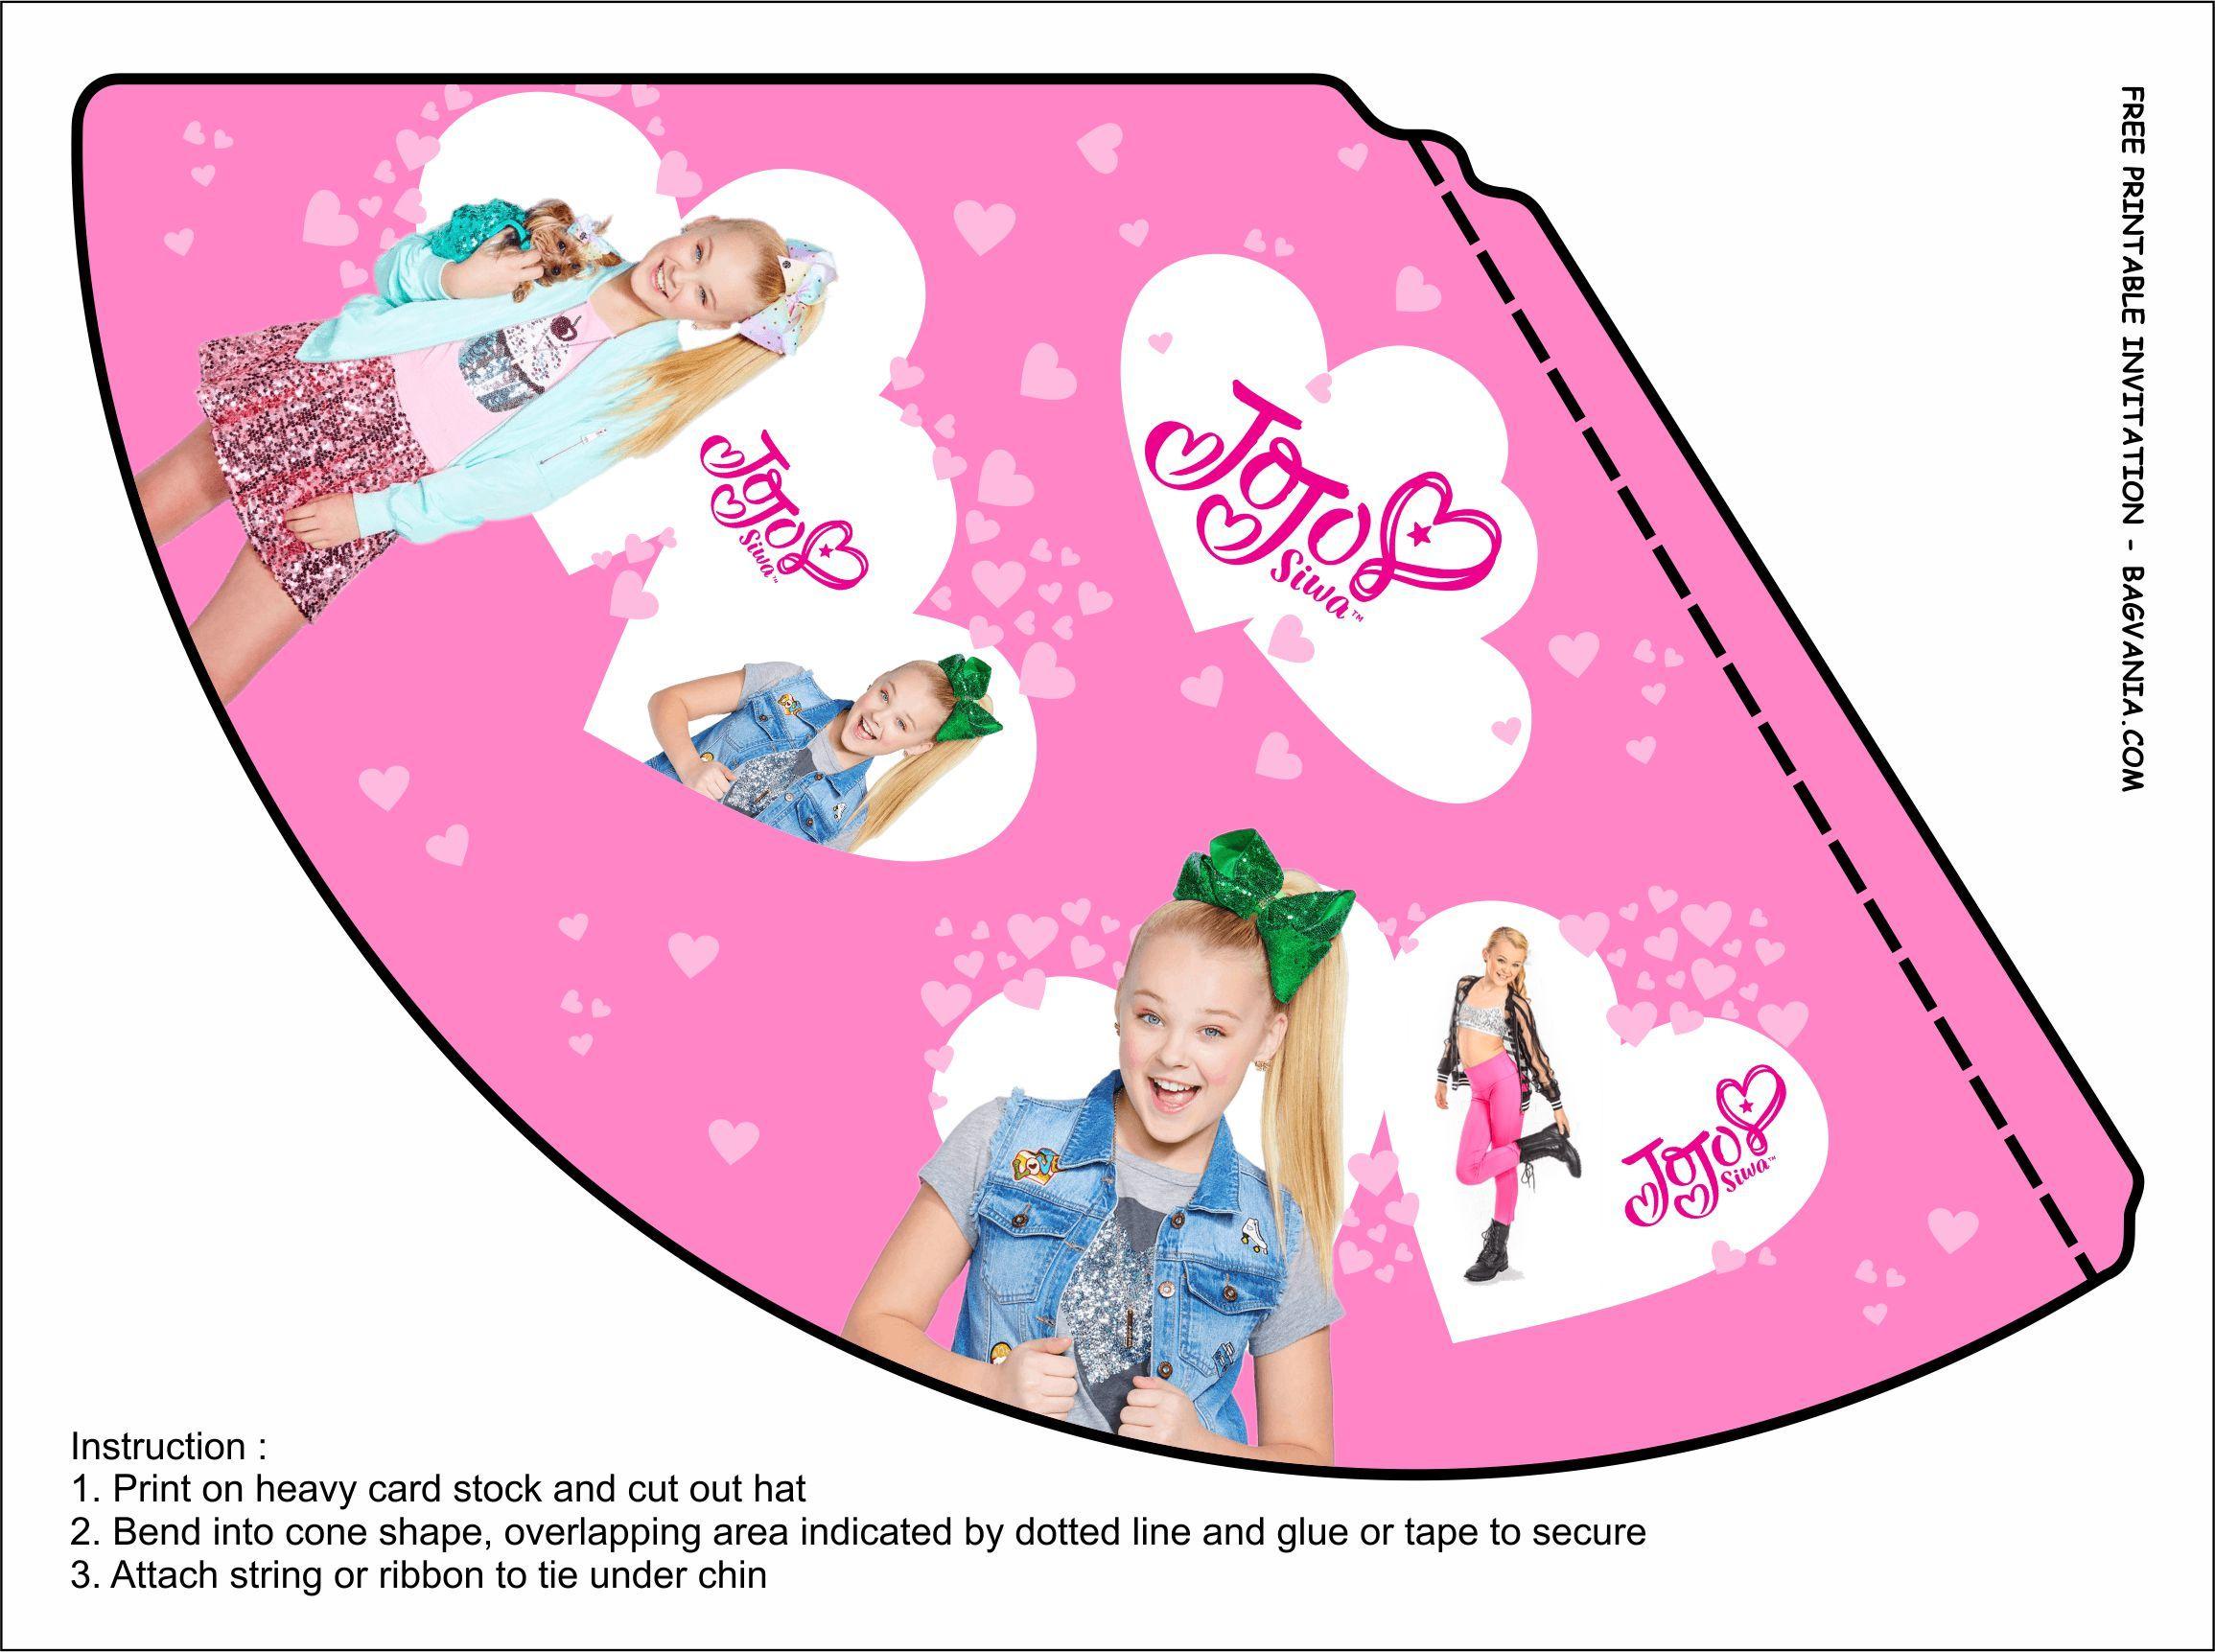 Free Printable Jojo Birthday Party Kits Template Birthday Party Kits Party Kits Jojo Siwa Birthday